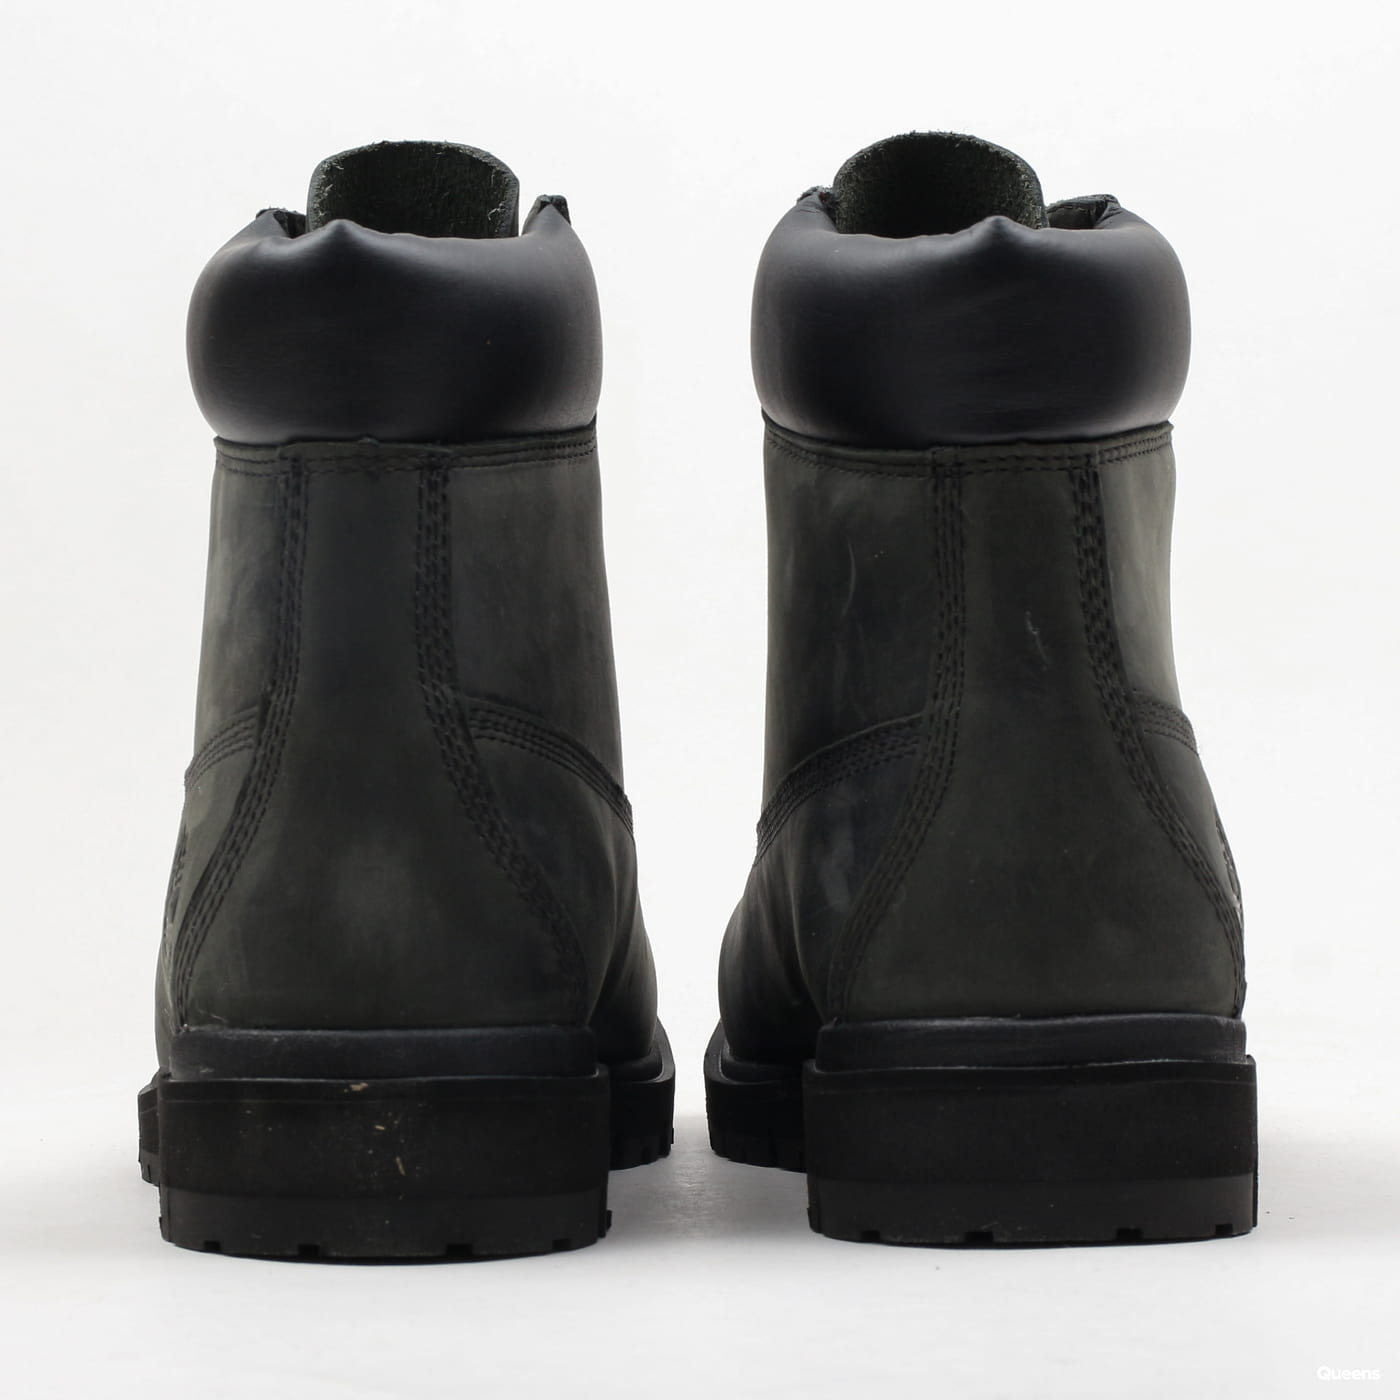 Timberland Radford 6 Inch WP Boot phantom